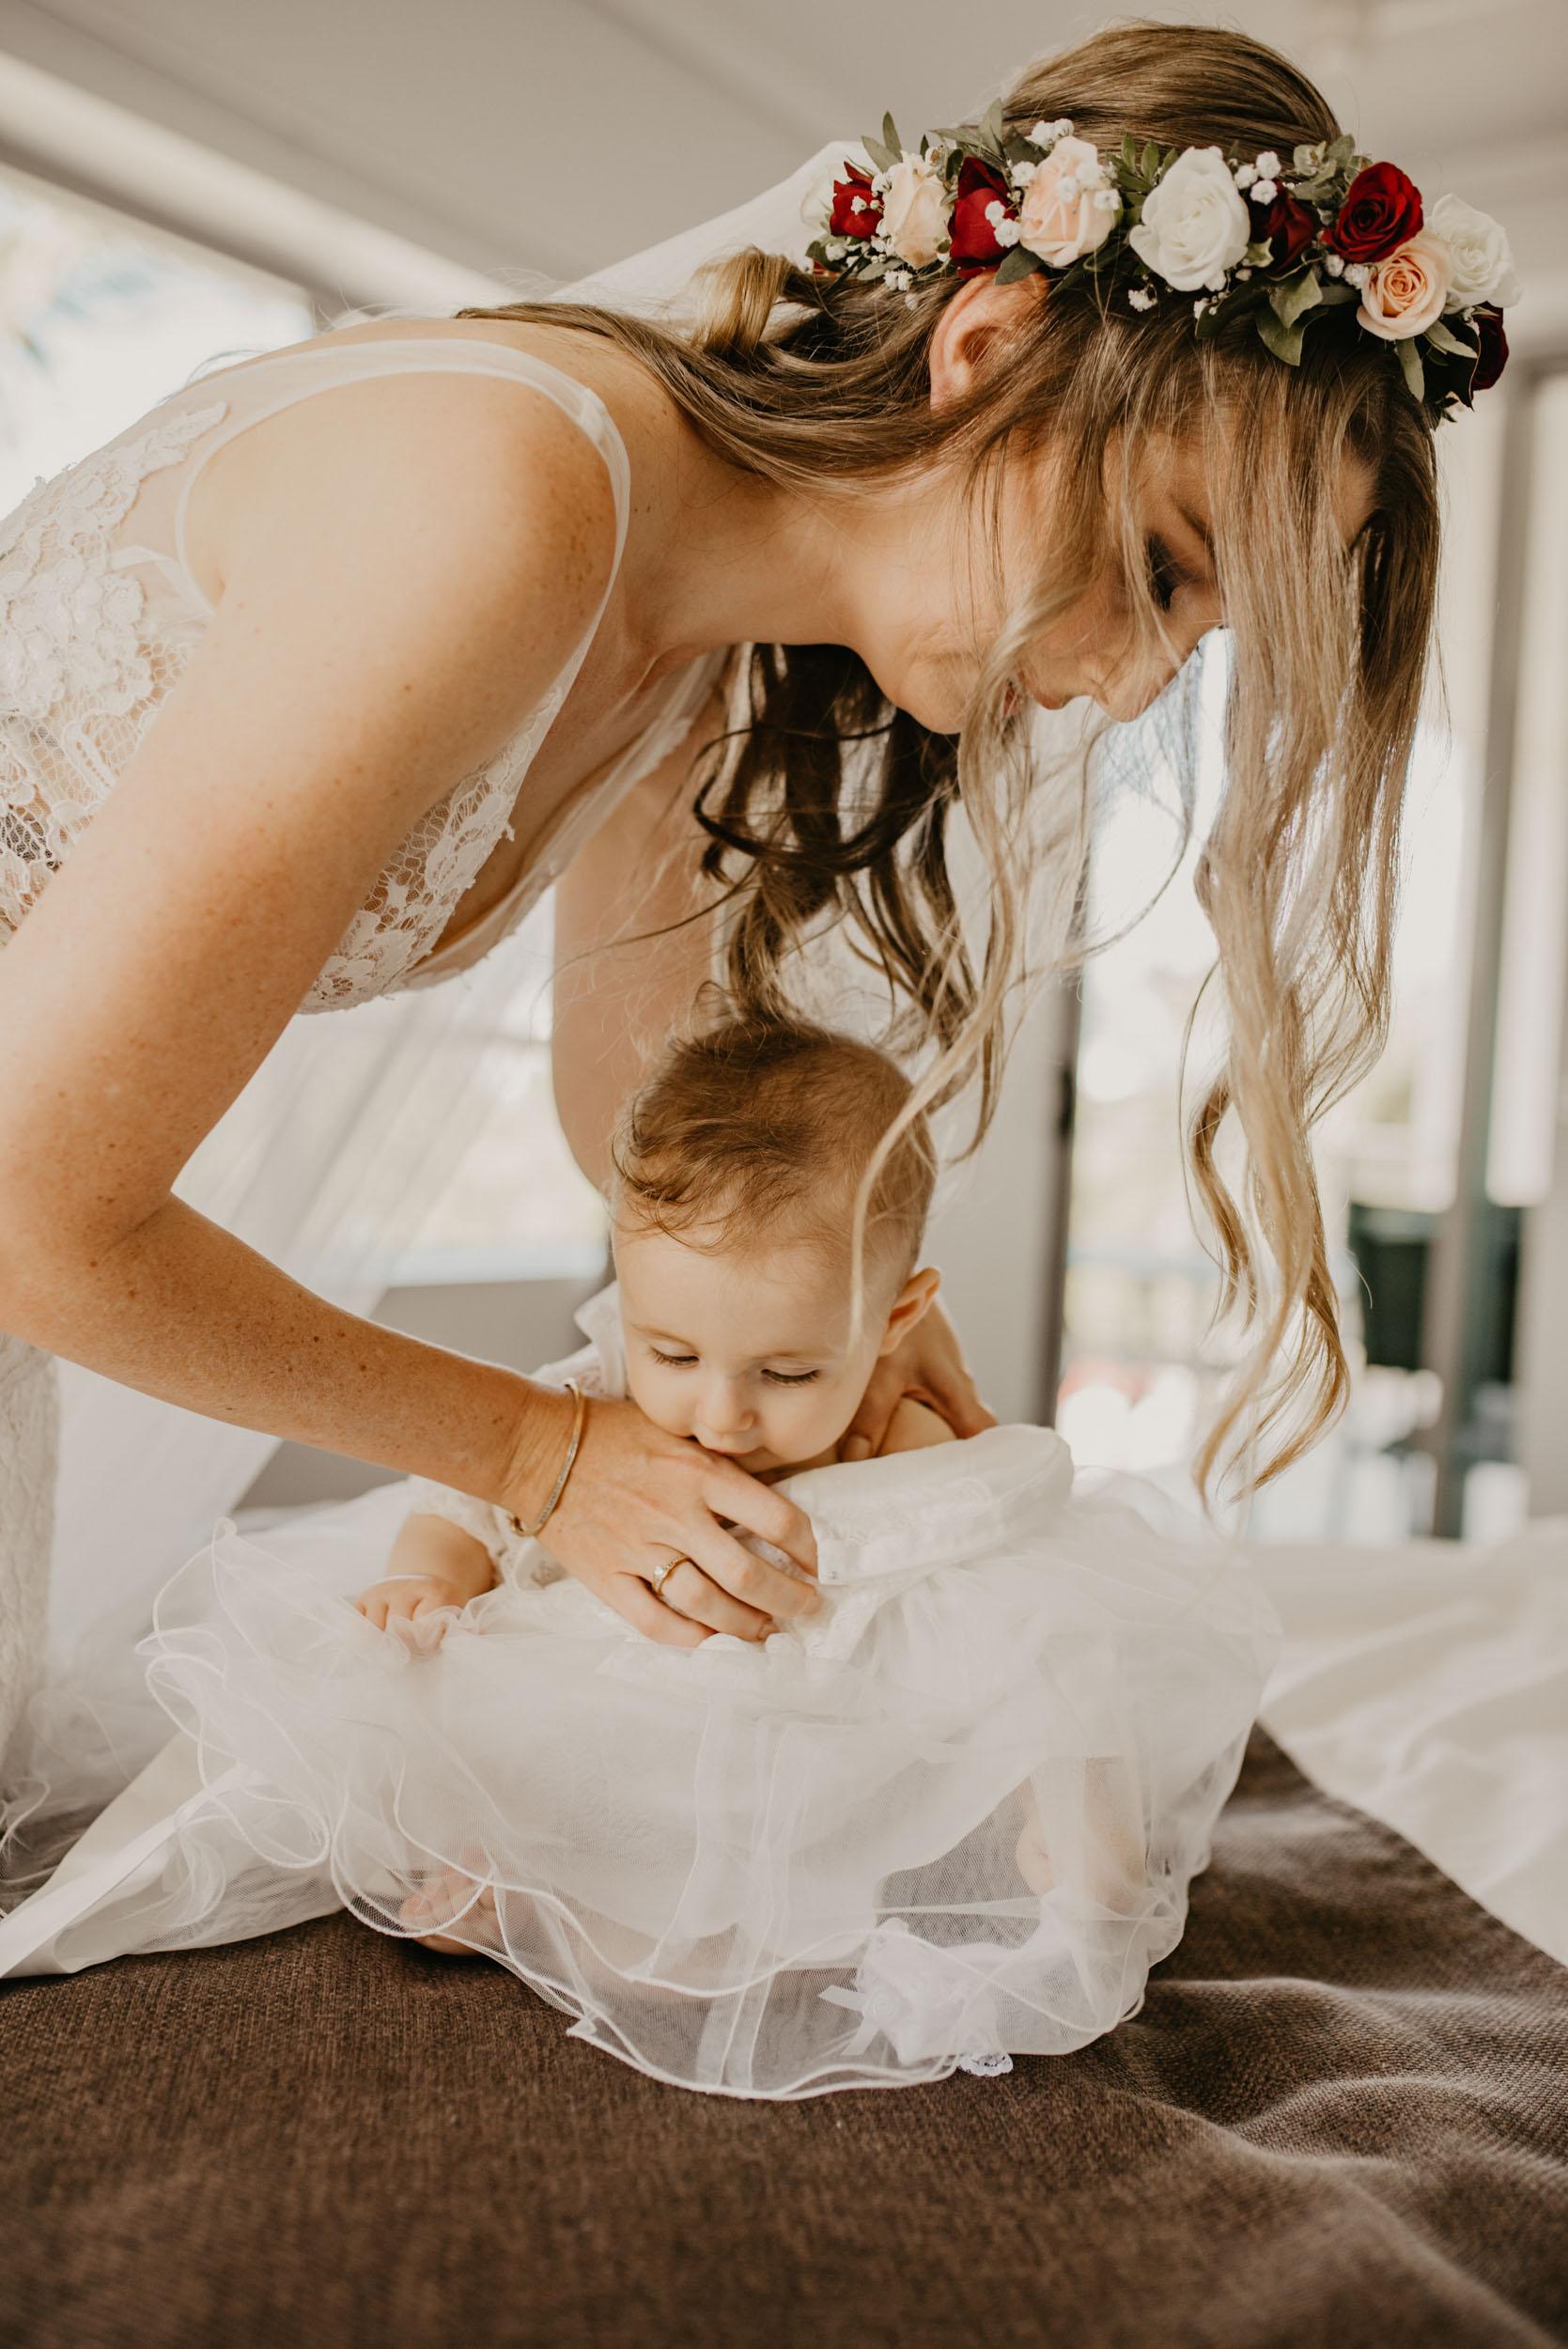 The Raw Photographer - Cairns Wedding Photographer - Laloli - Cairns Garden Ceremony - Cane Fields Photo Shoot-18.jpg